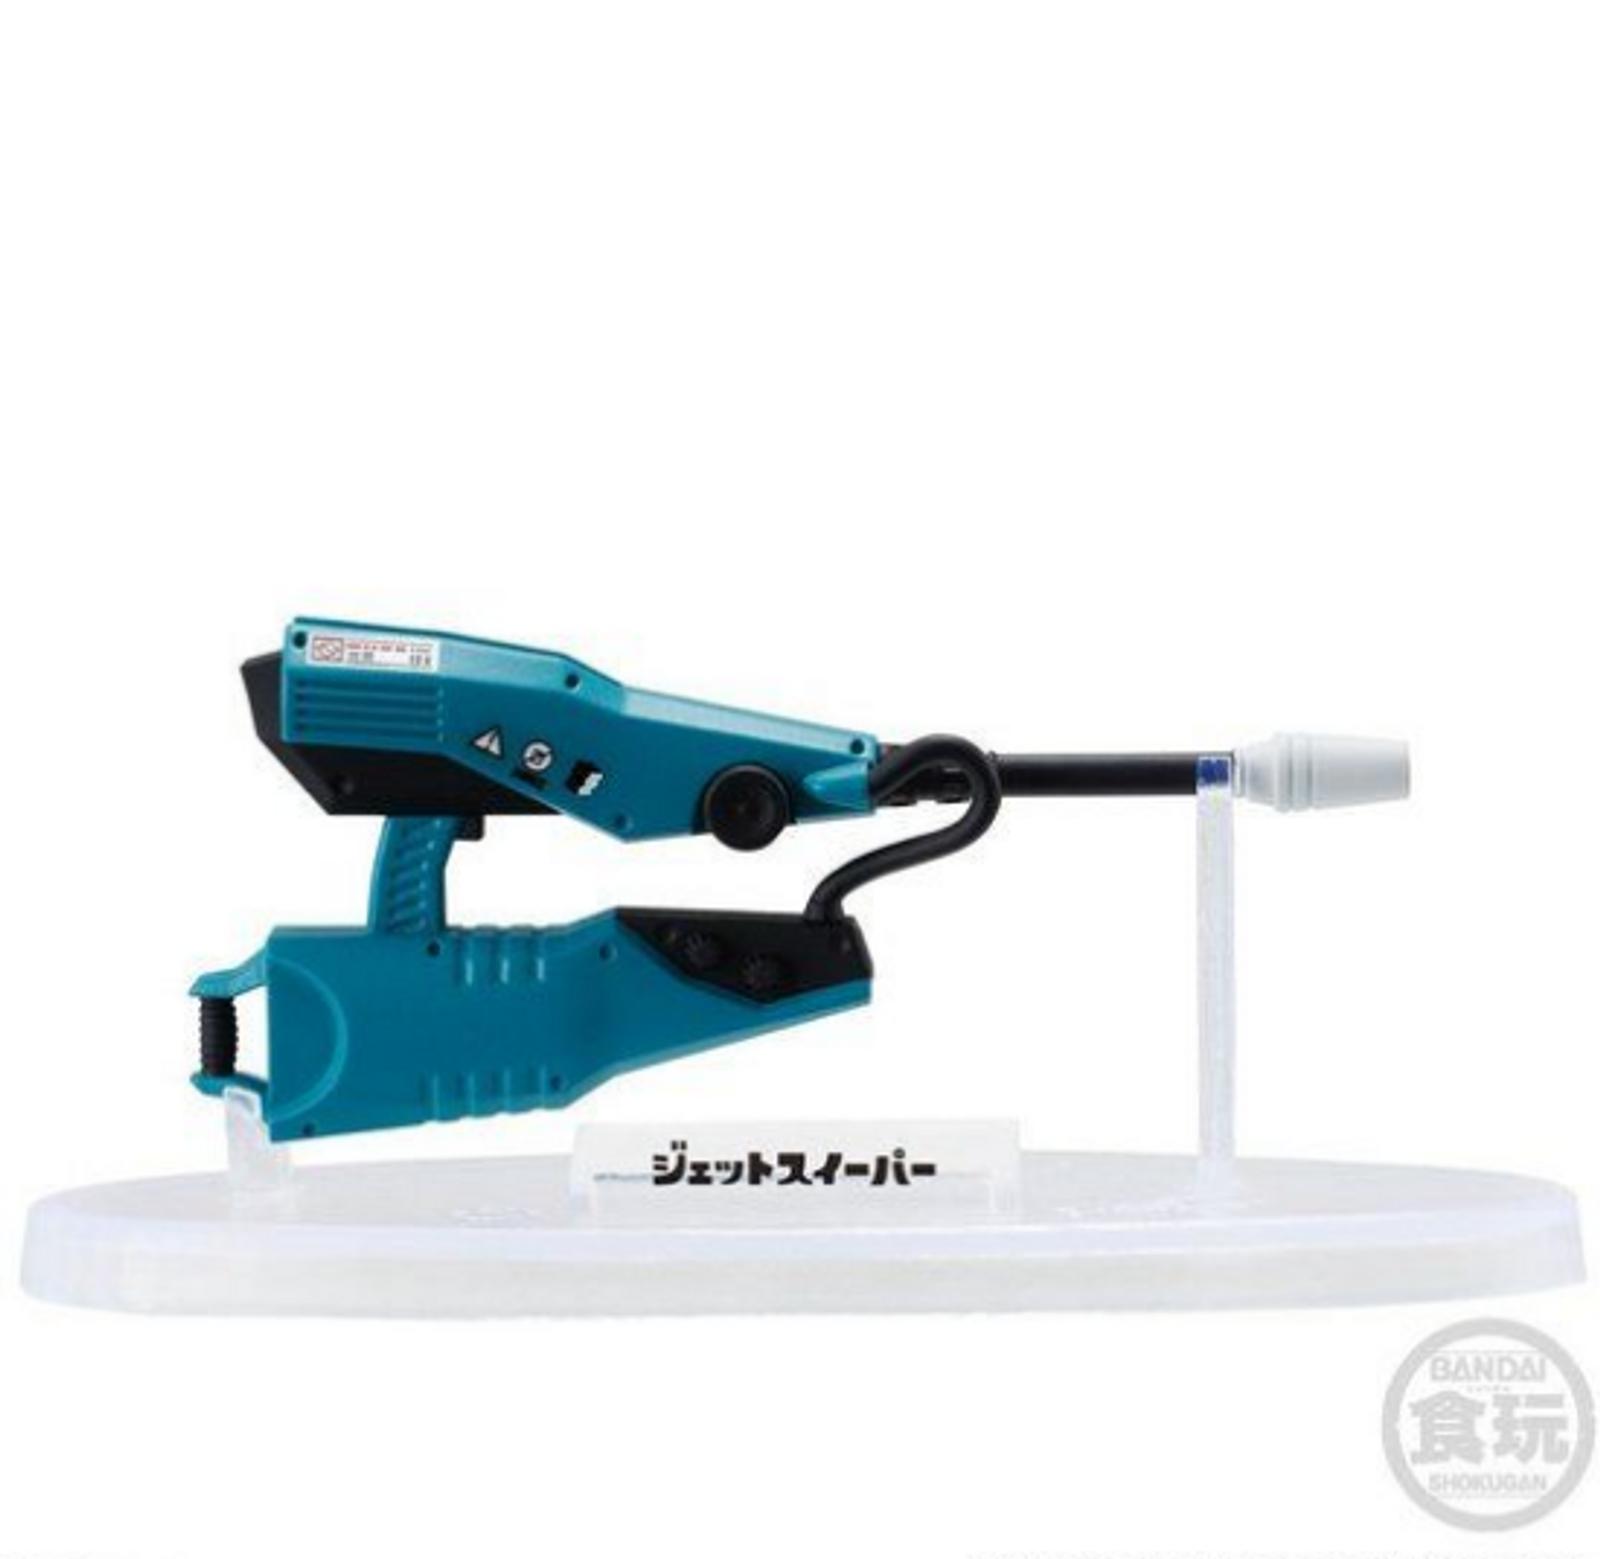 Splatoon 2 Jet Squelcher Weapon Figure Collection JAPAN Nintendo Switch